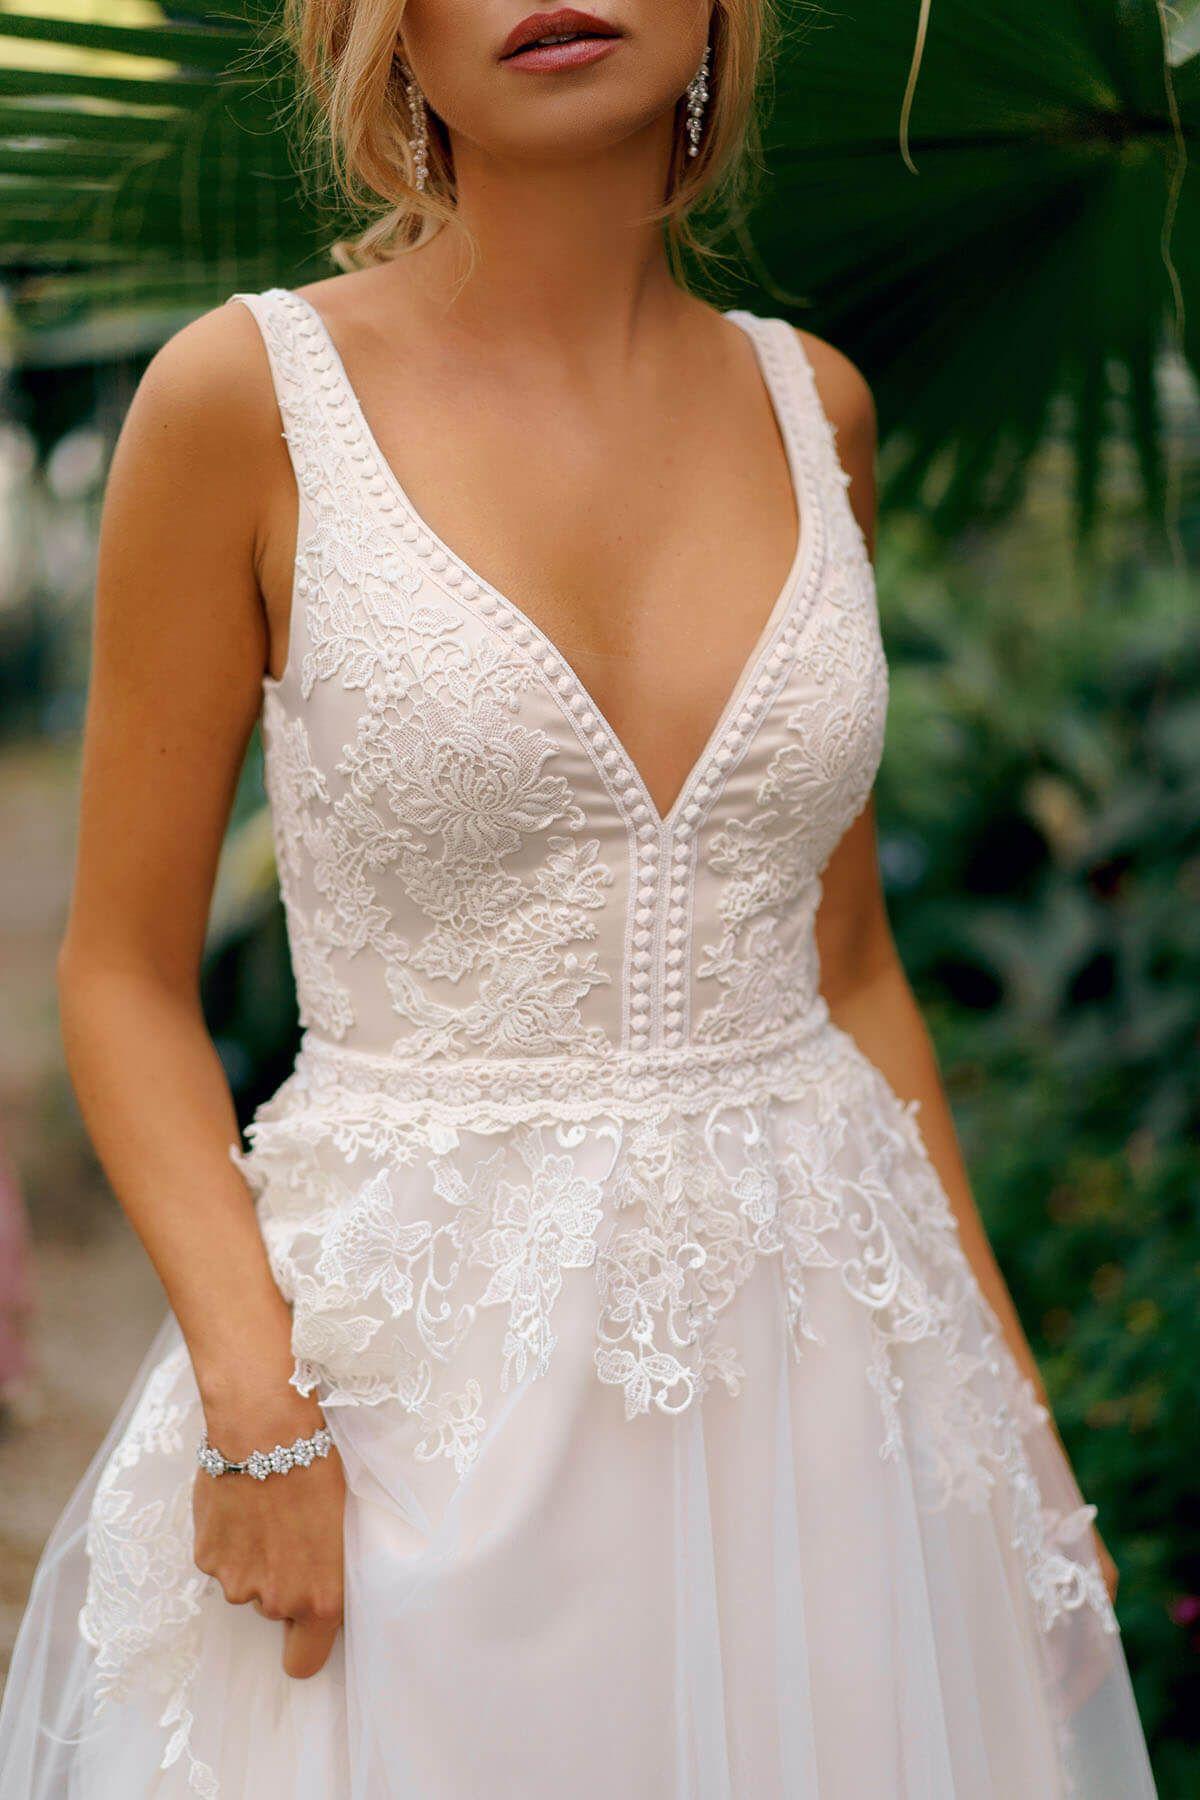 Goplana Dama Couture Wedding Dresses Sleeveless Wedding Dress Dresses